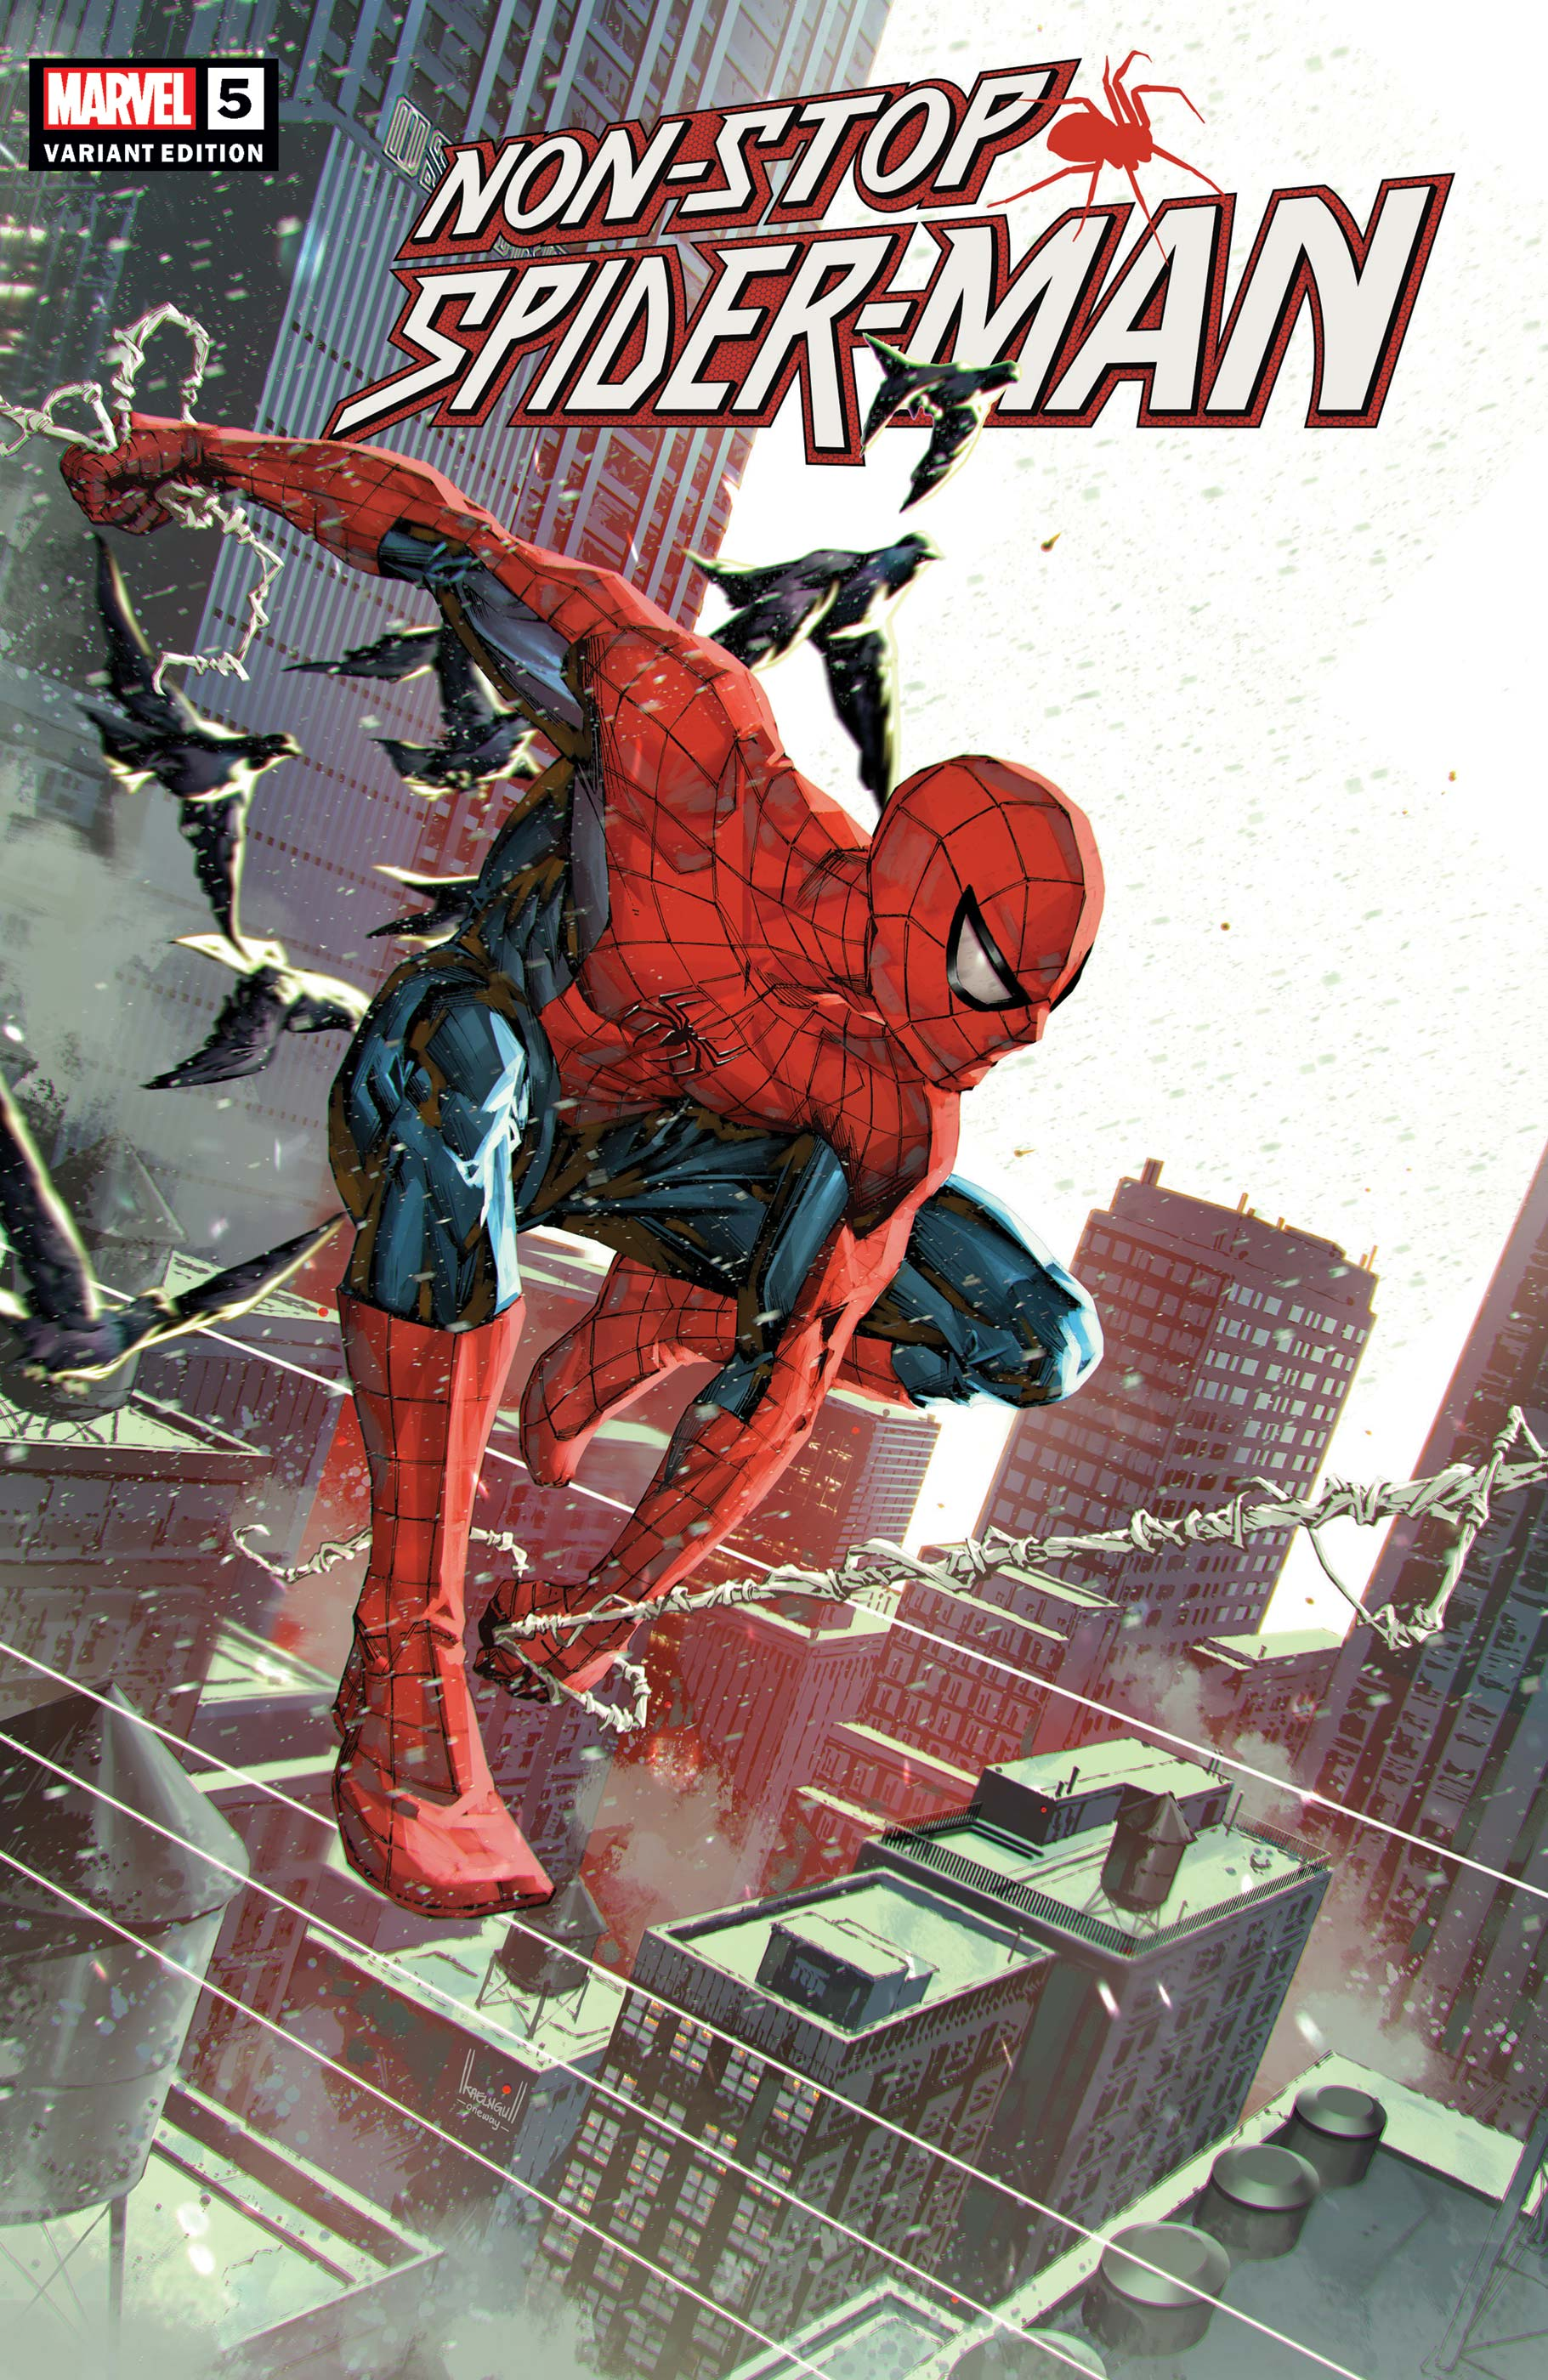 Non-Stop Spider-Man (2021) #5 (Variant)